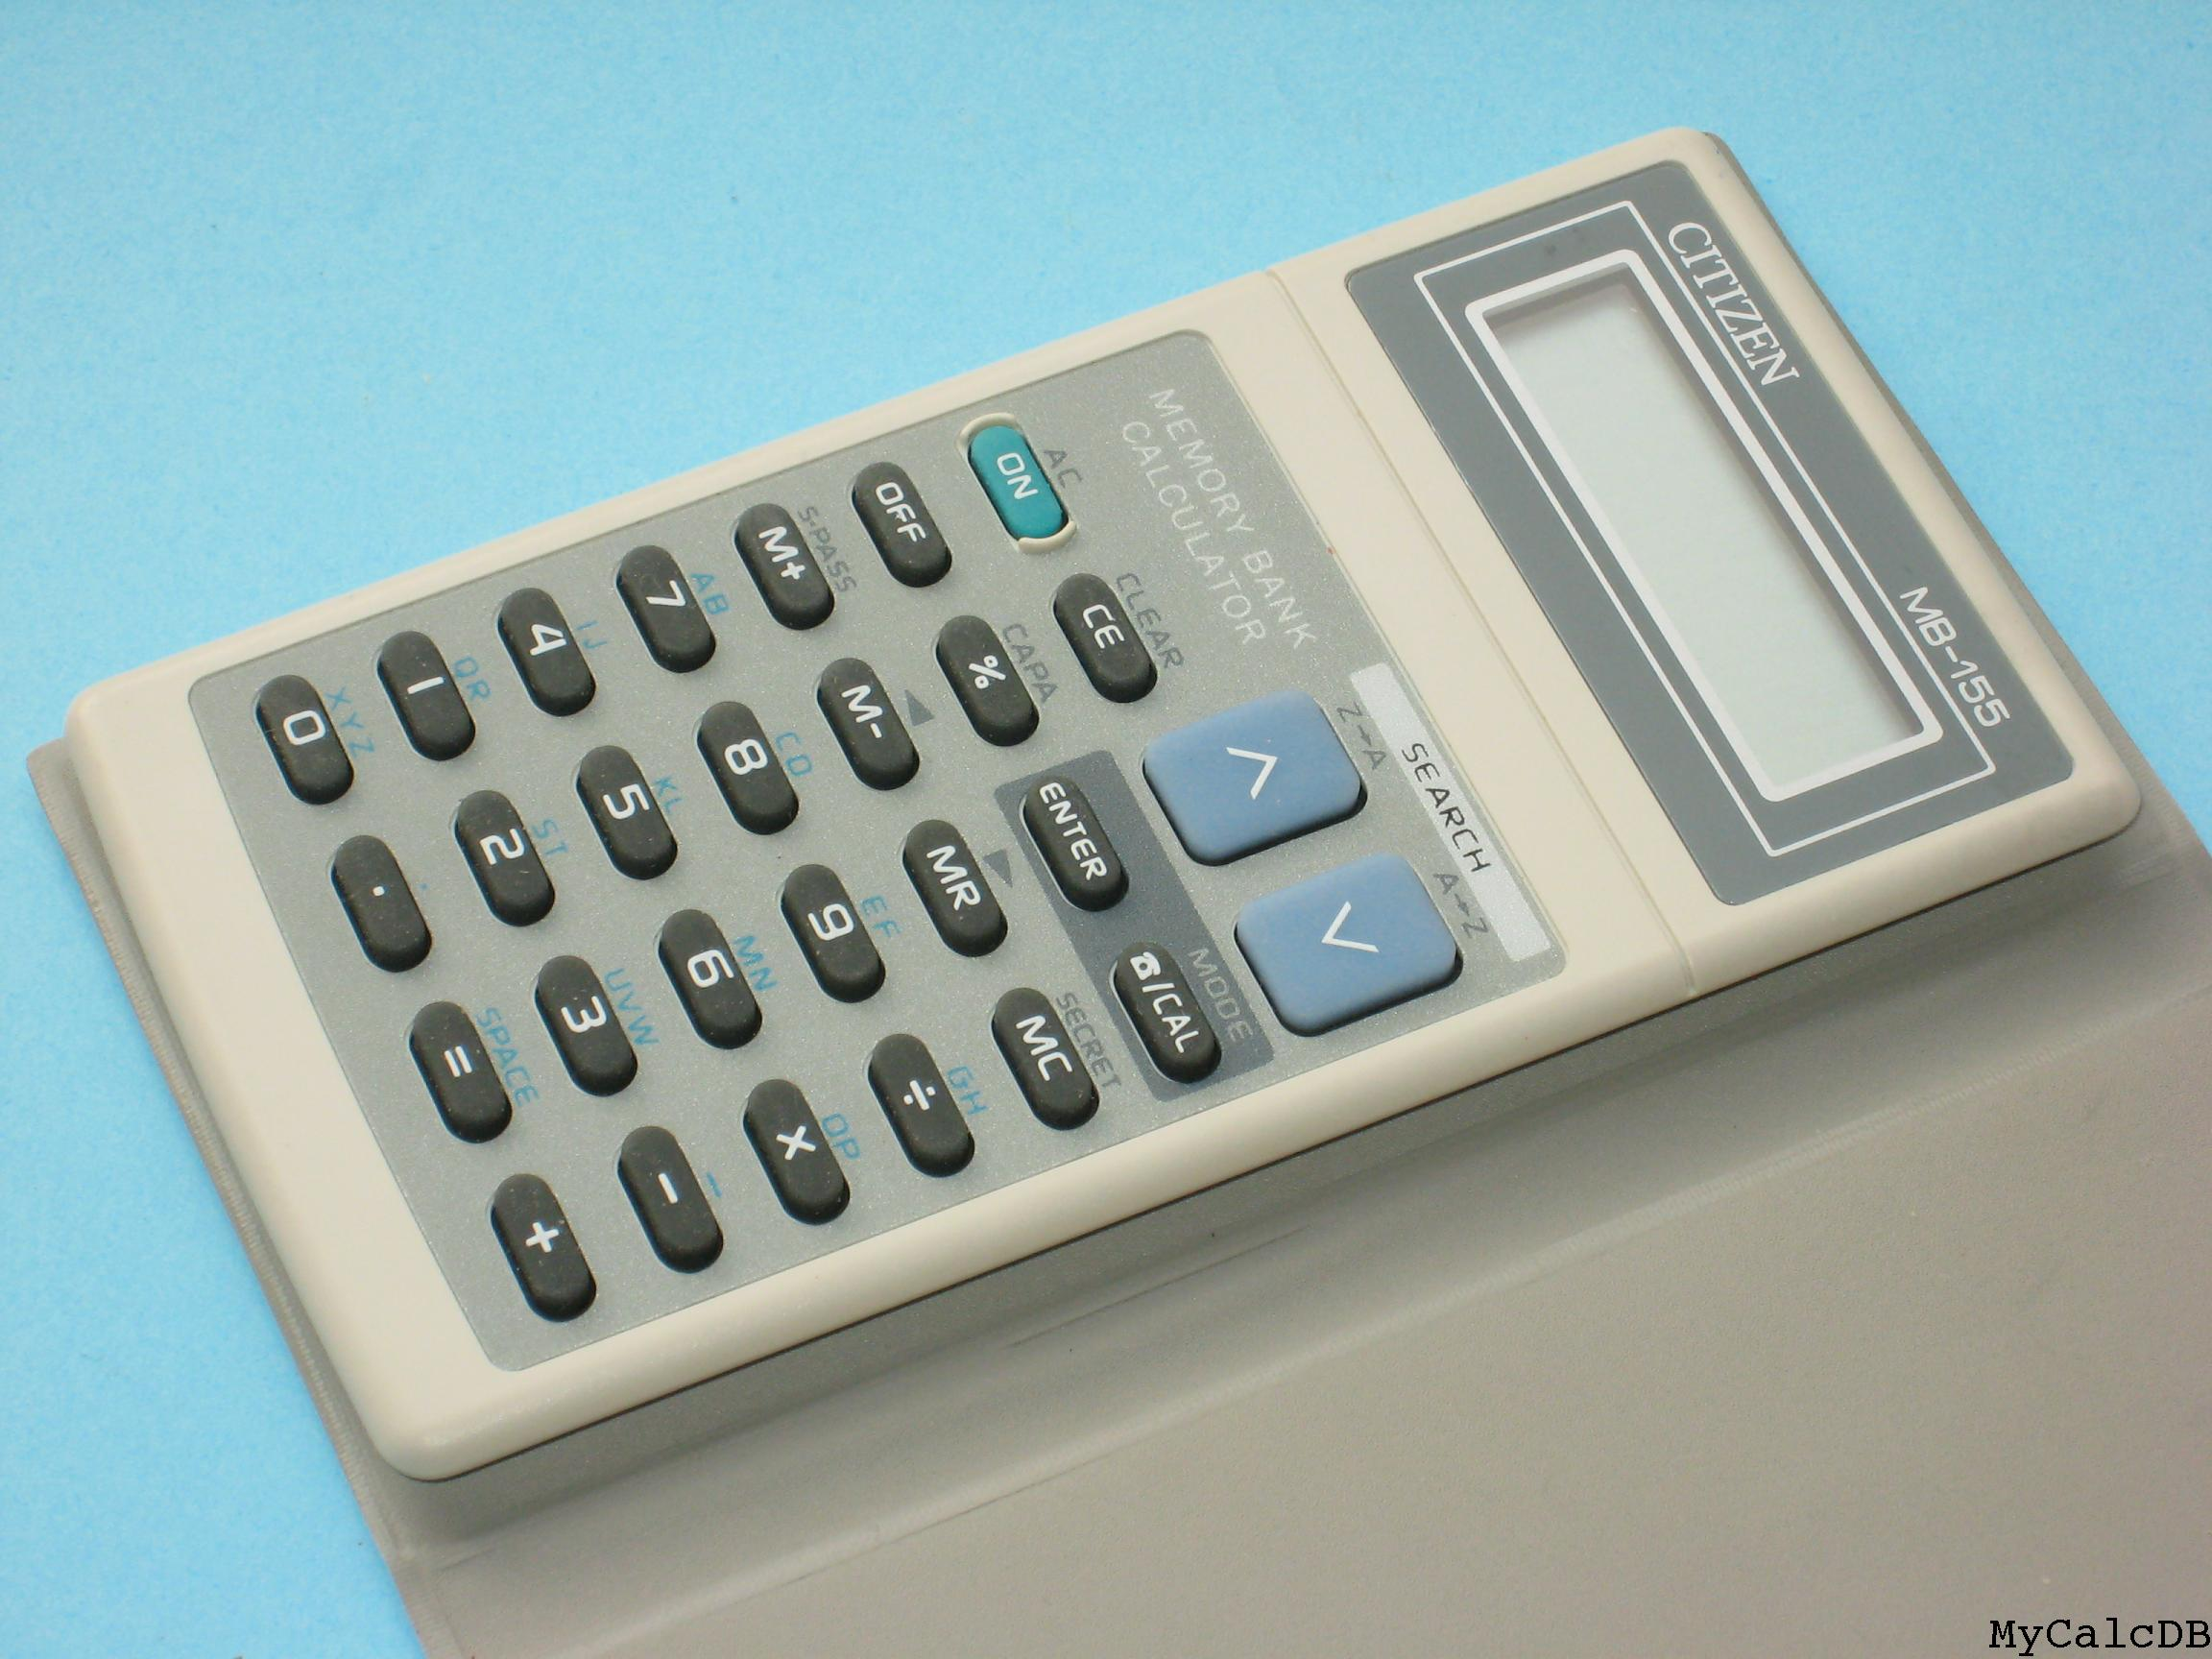 Citizen Mb 155 It History Society Calculator